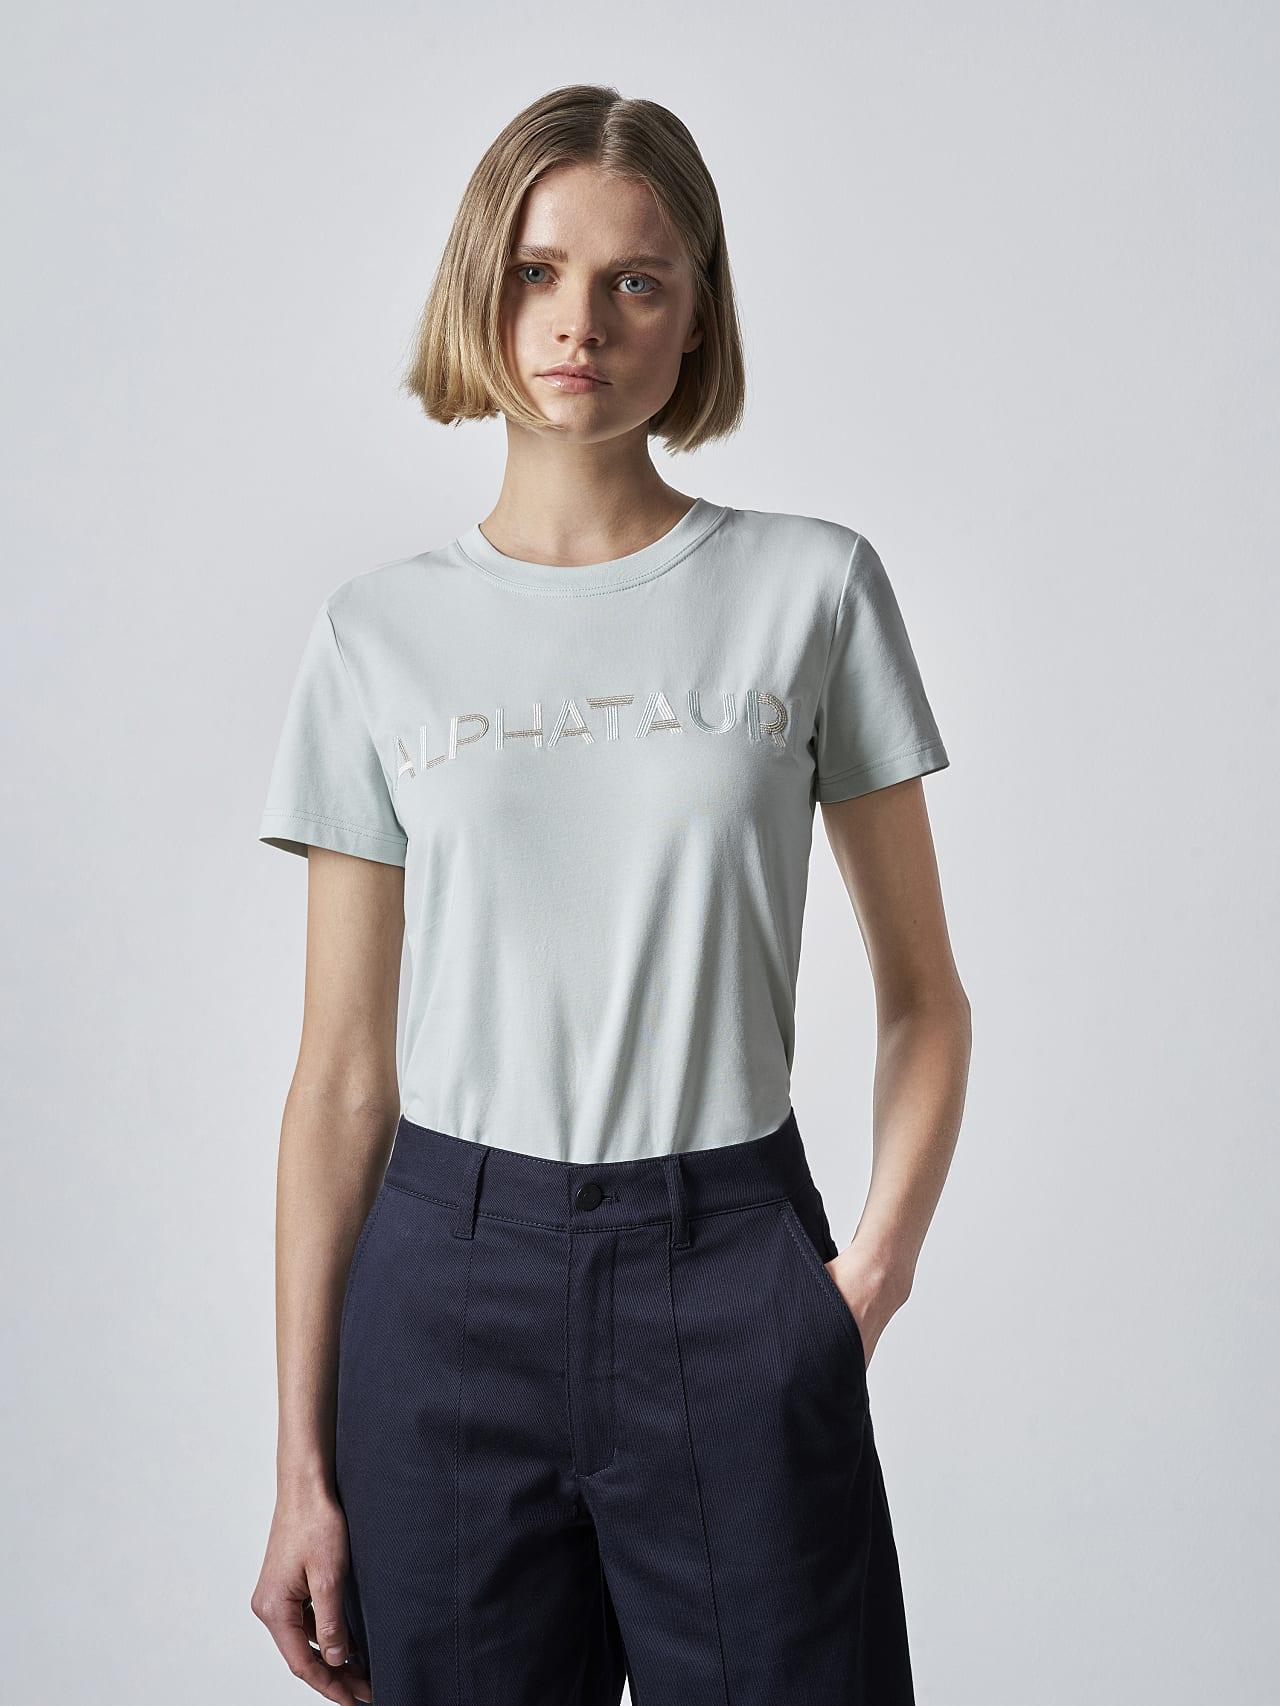 JOCTI V3.Y5.02 Logo T-Shirt Pale Blue  Model shot Alpha Tauri